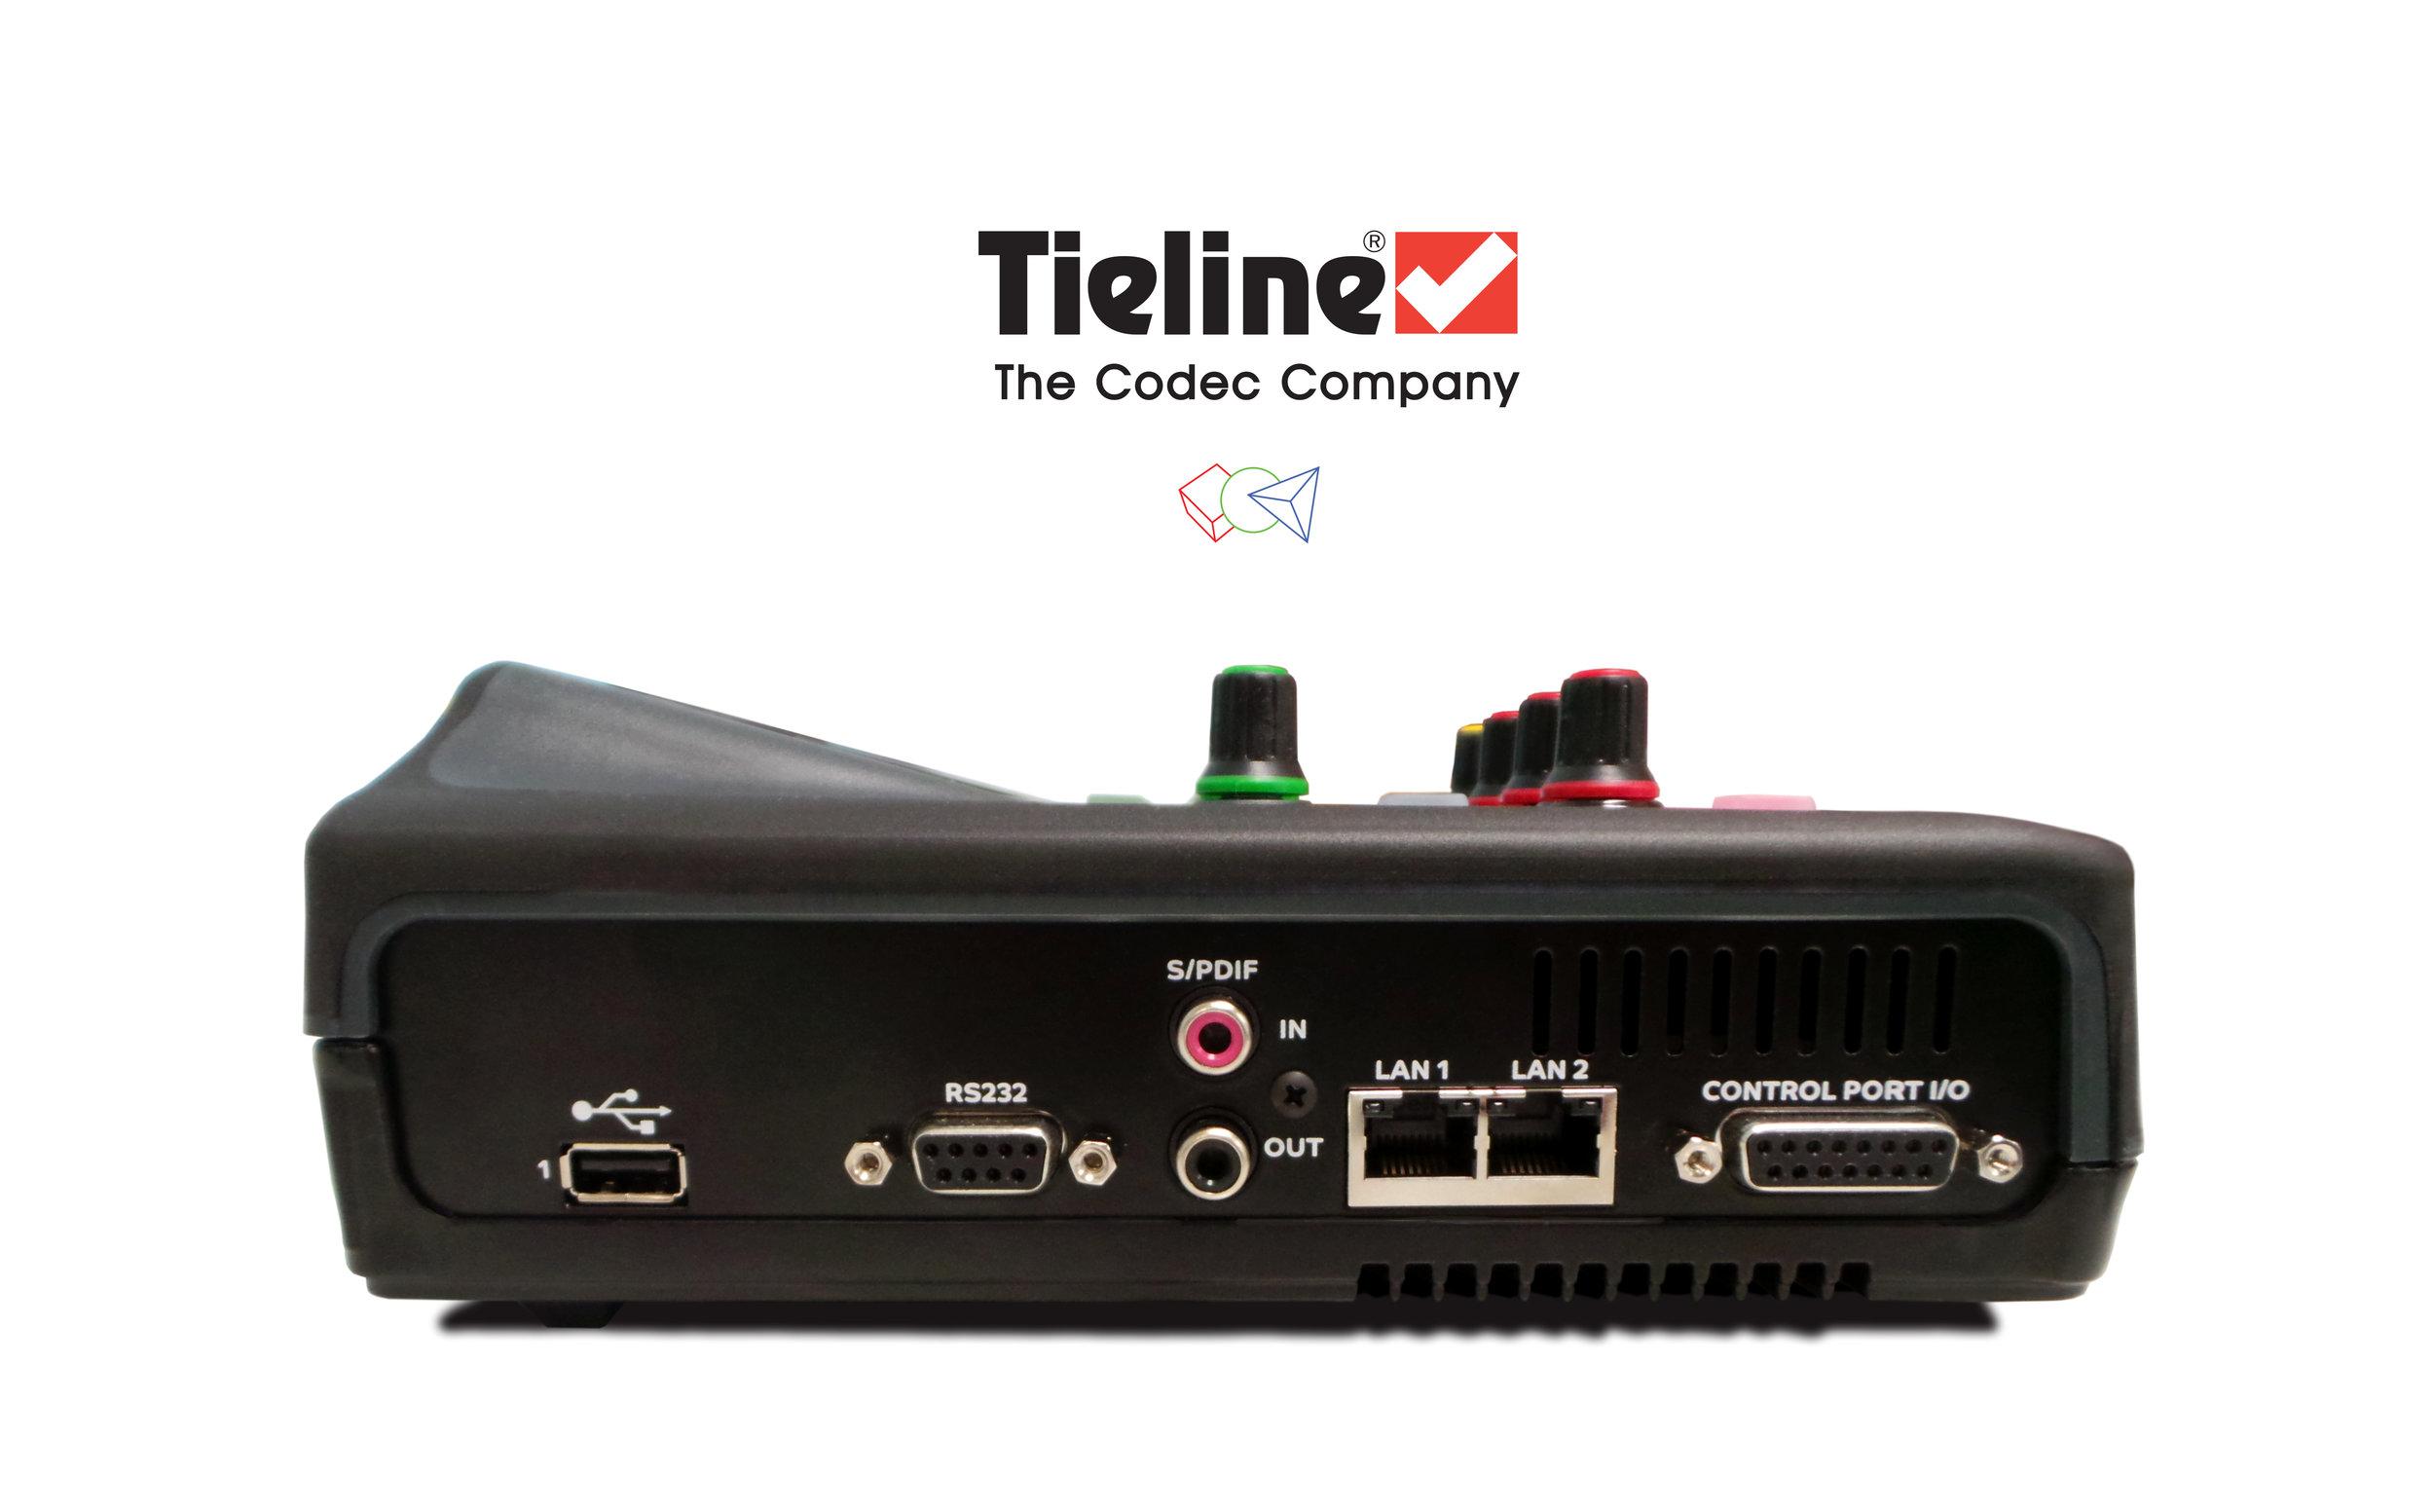 Tieline_5.jpg